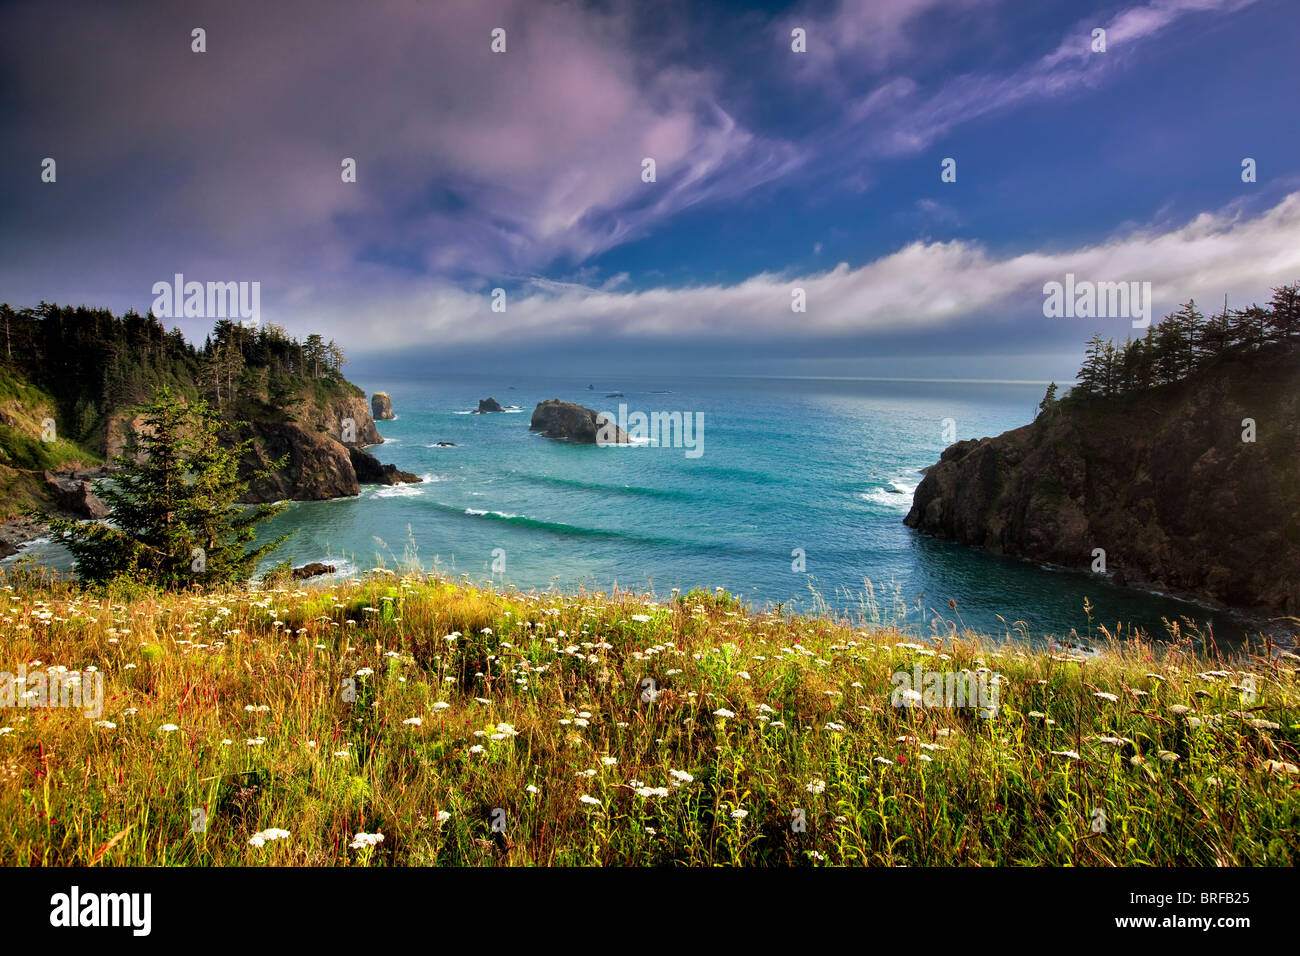 Wildflowers and cove. Samuel H. Boardman State Scenic Corridor. Oregon - Stock Image